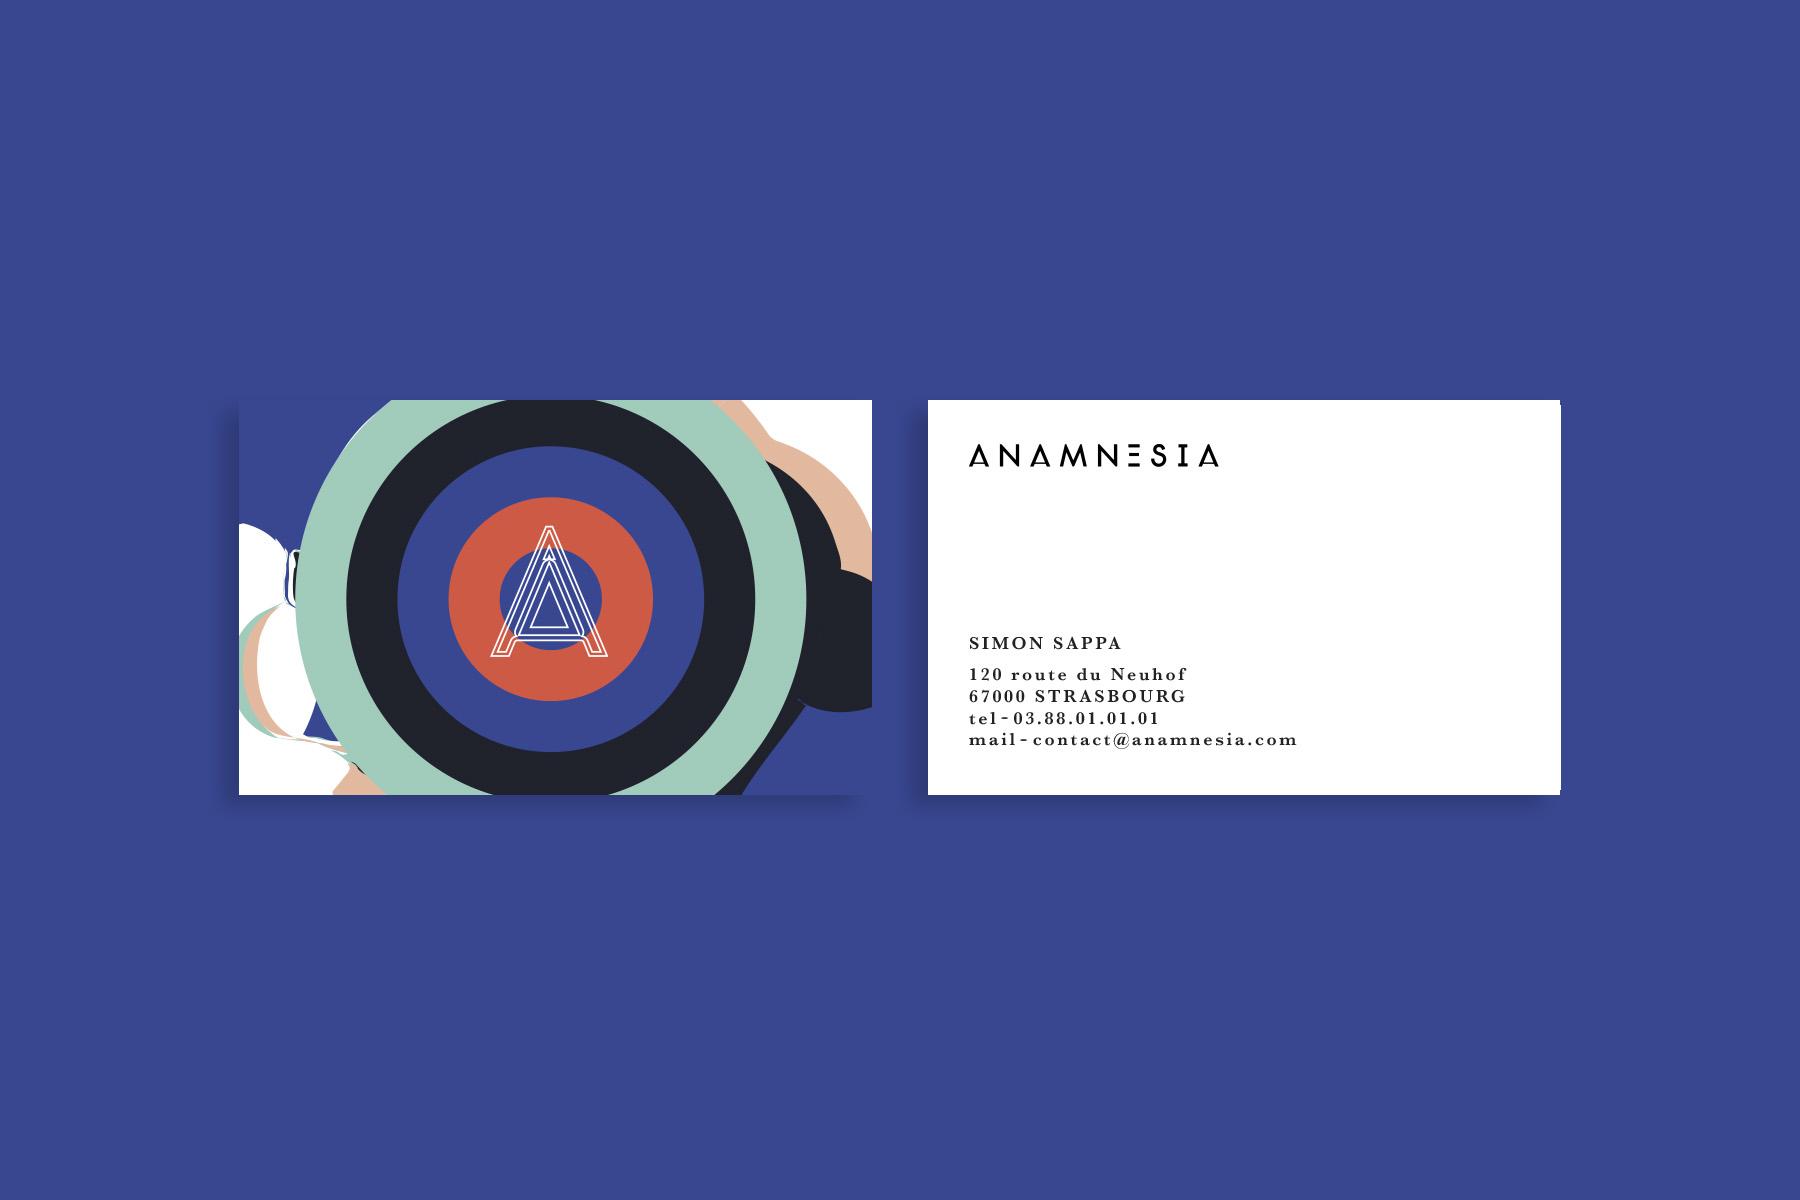 anamnesia_noemiecedille04